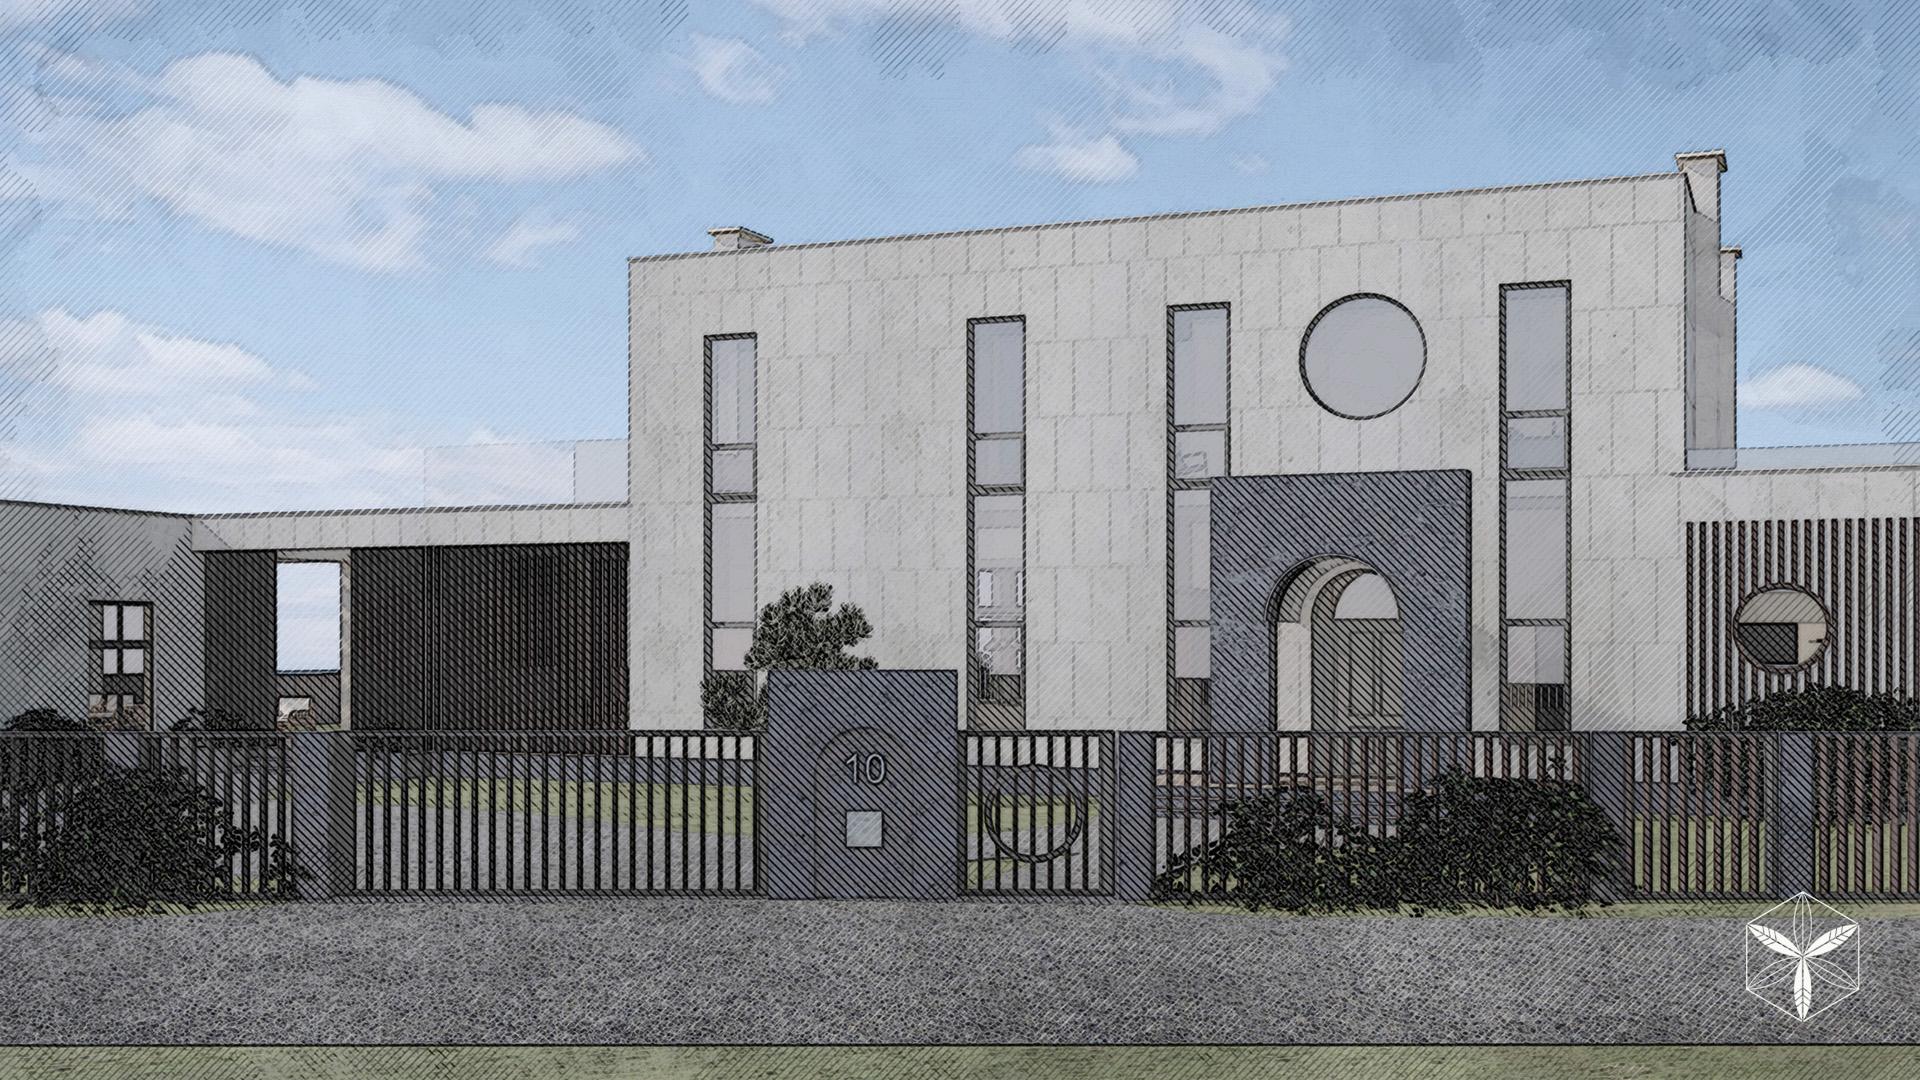 Изображение для проекта Проект особняка в Латвии в стиле модерн 2878